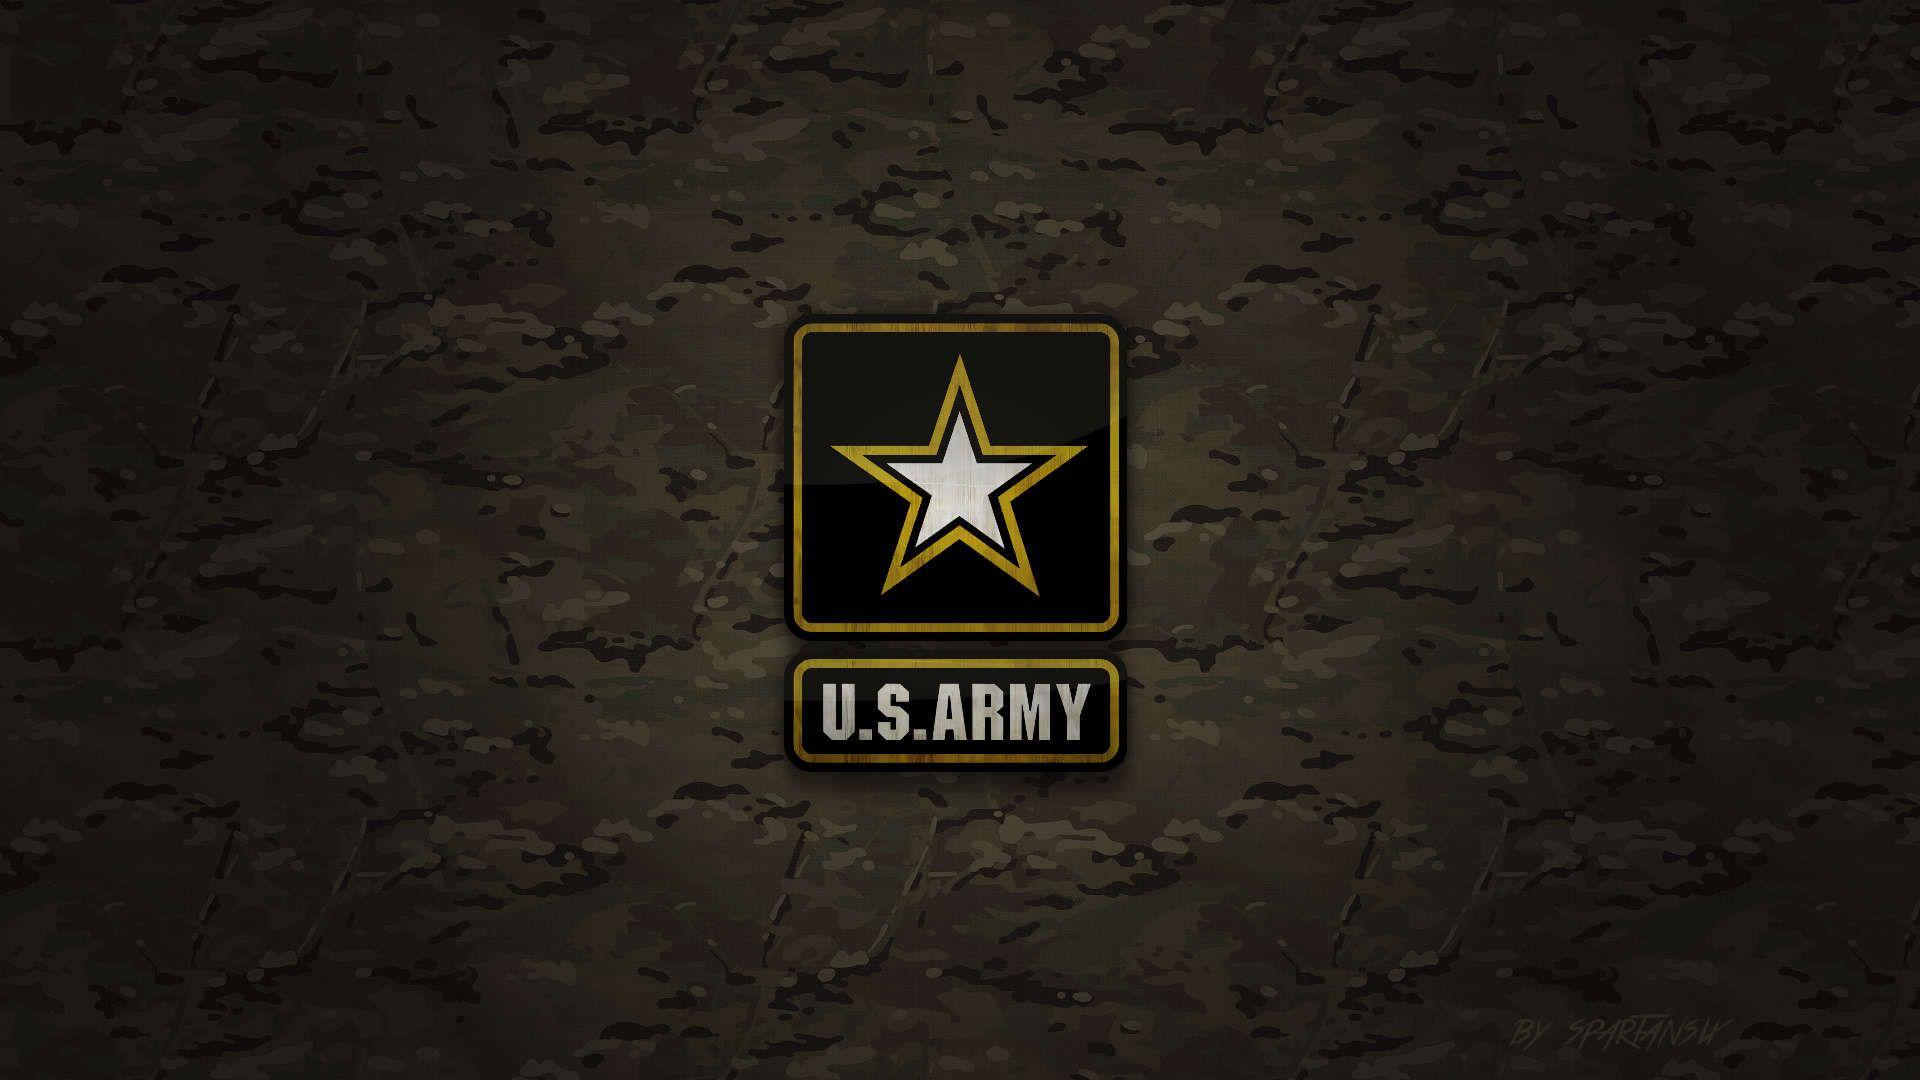 us army wallpaper o us army wallpaper HD